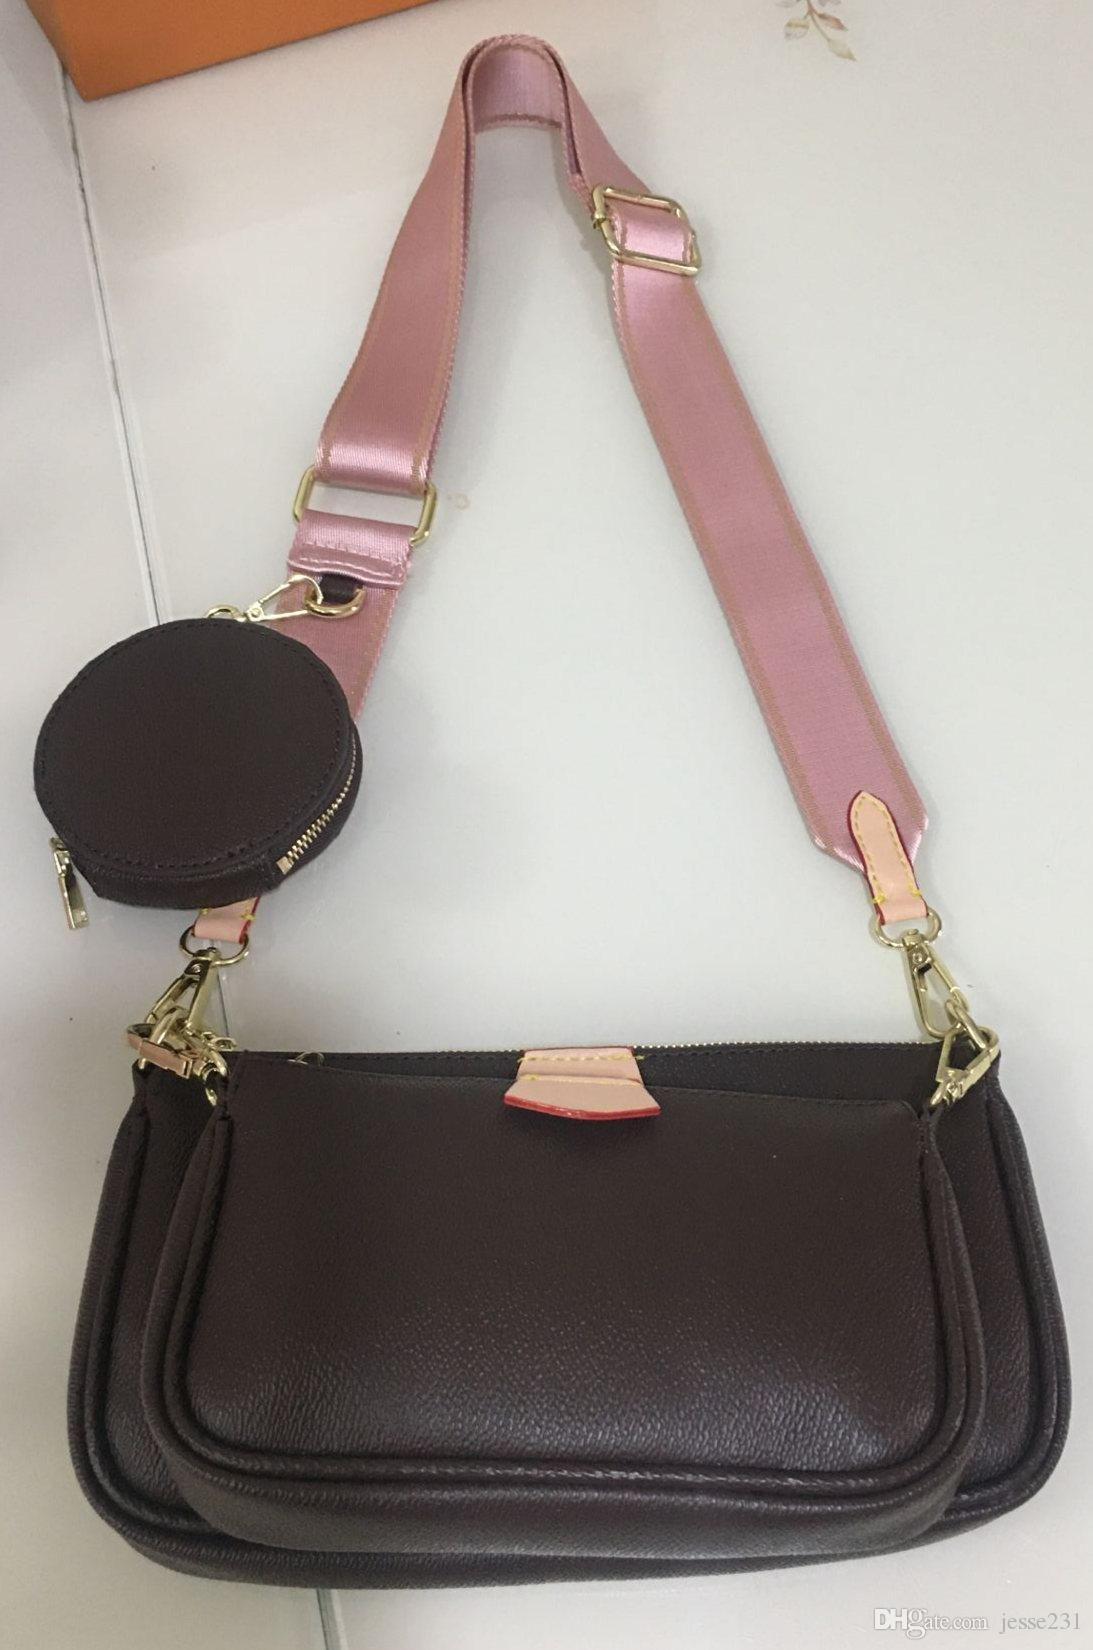 Trois sacs en cuir 3 pièces Sacs de mode Femmes Purse Sac Sac à main Véritable Set Article Tote Sale Sacs Sacs Coin Coin Cross Body Sacs EHCTD